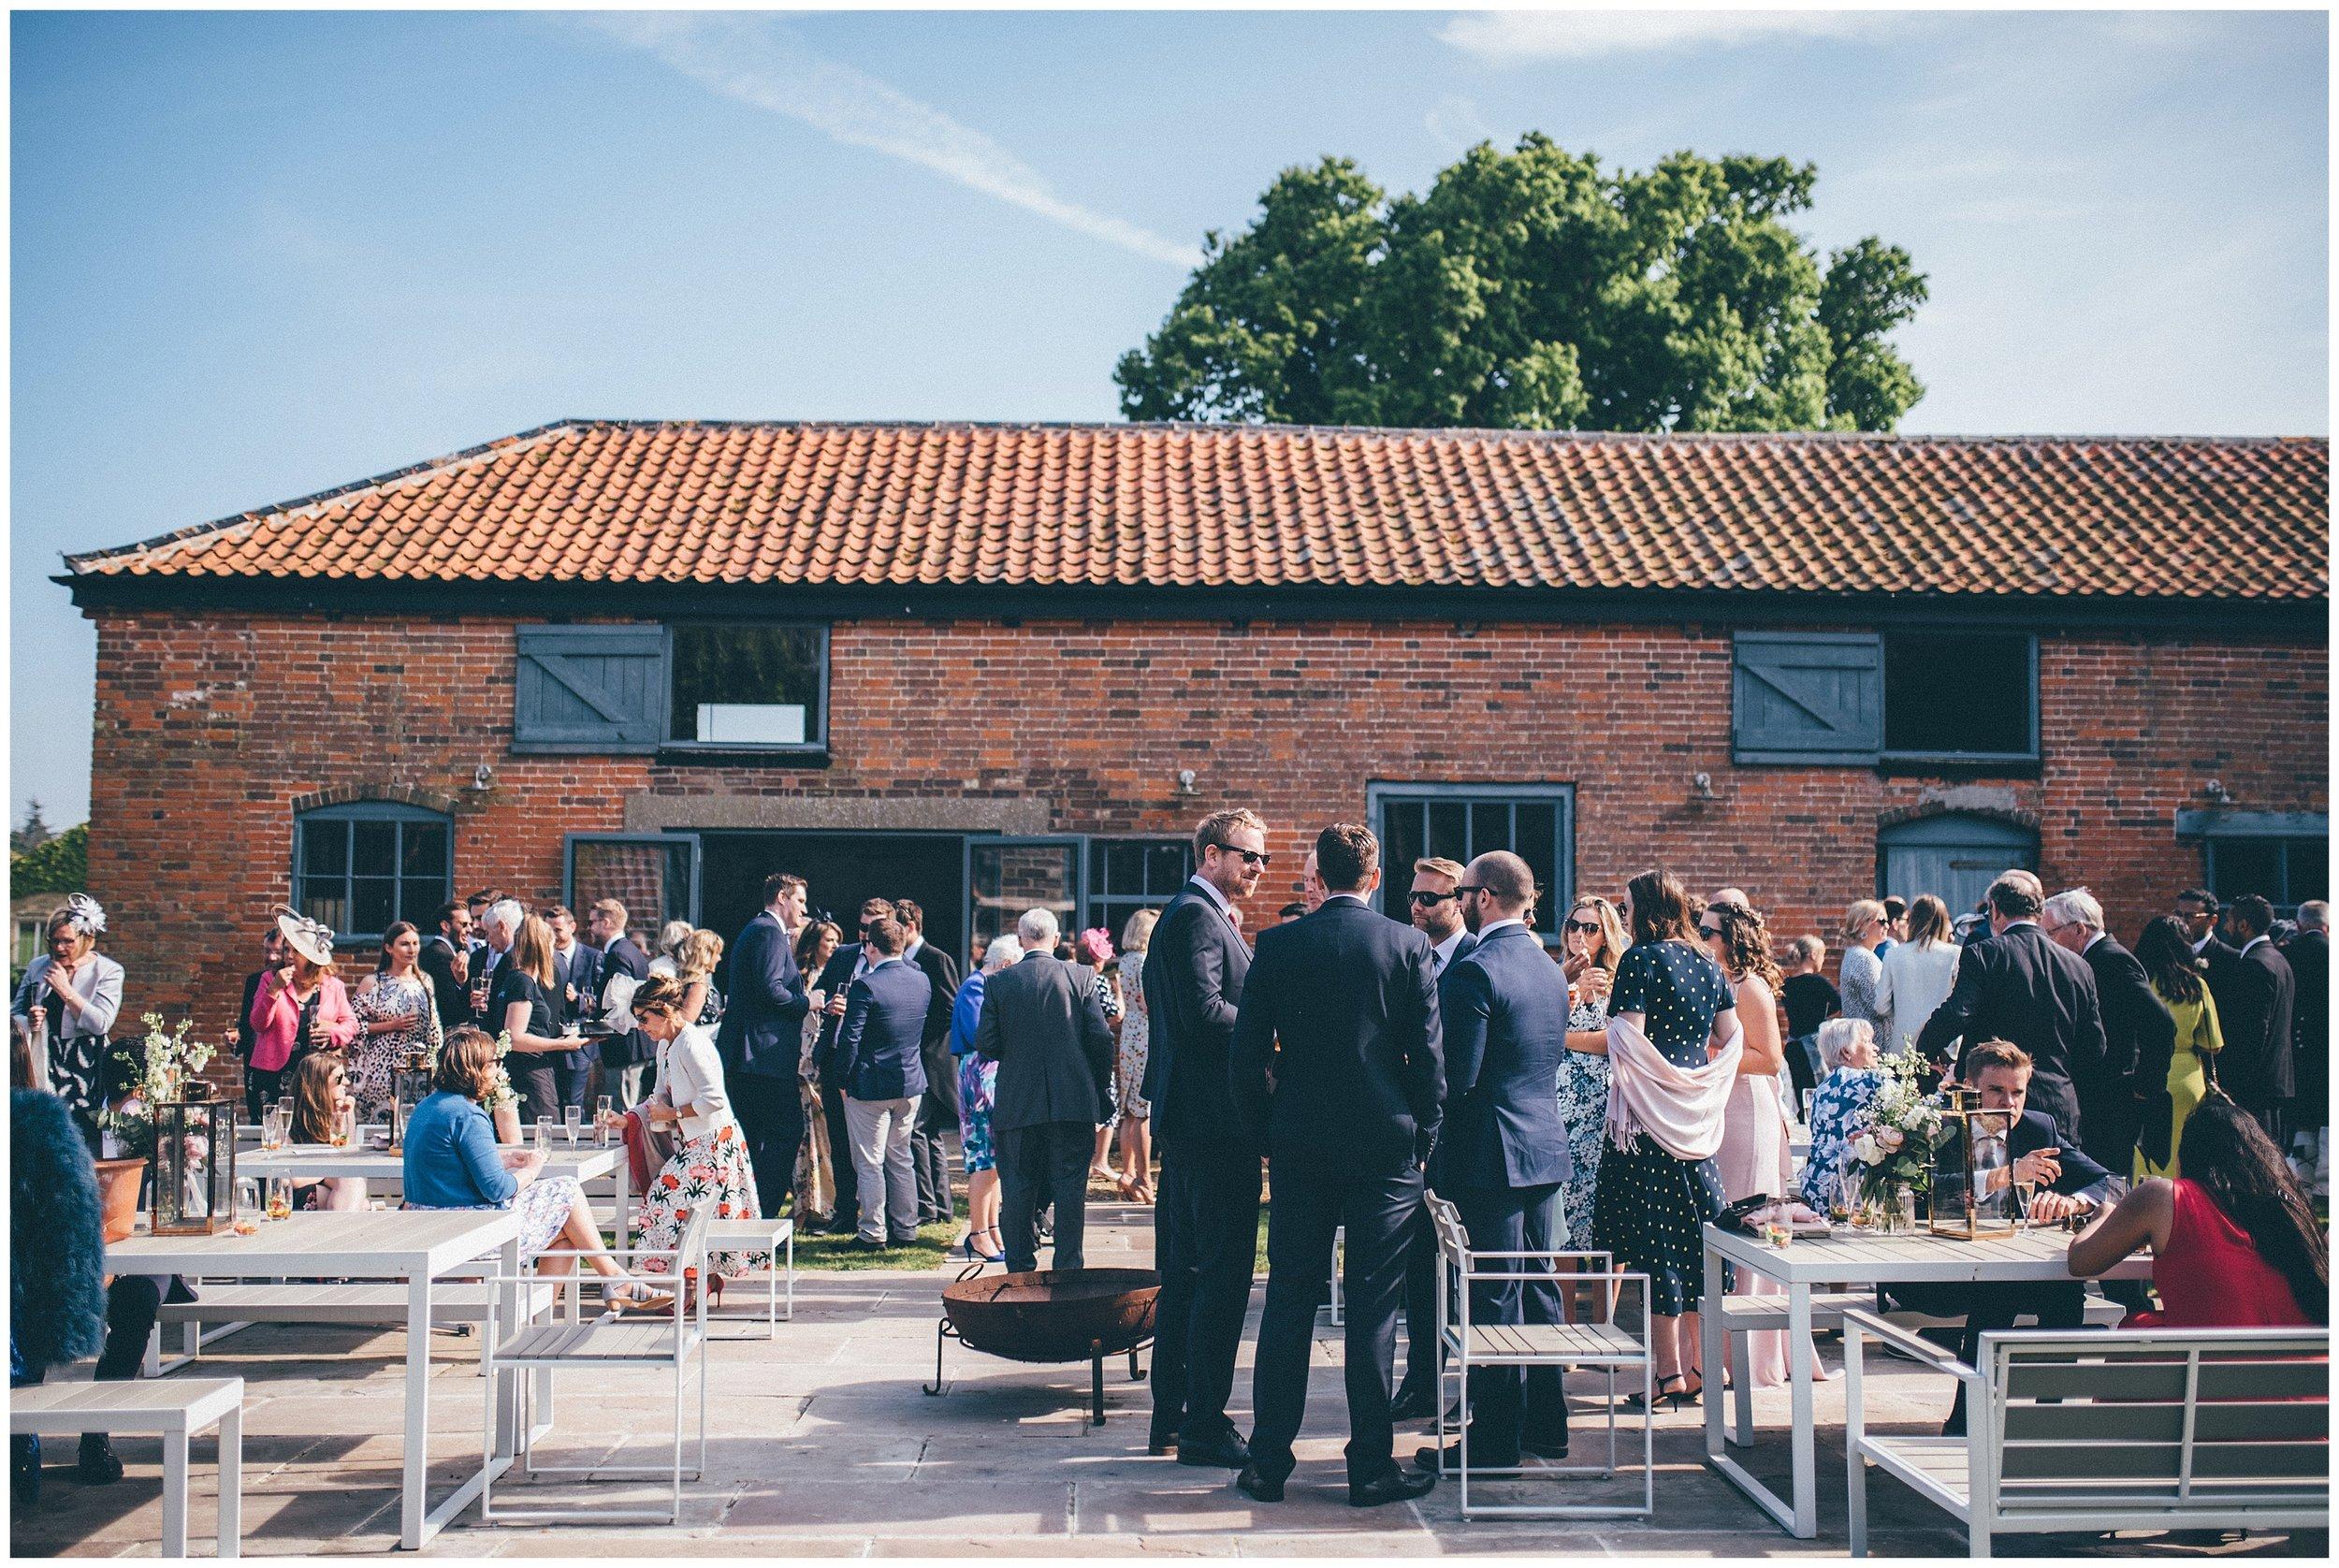 Wedding guests enjoying the reception at Henham wedding barns.